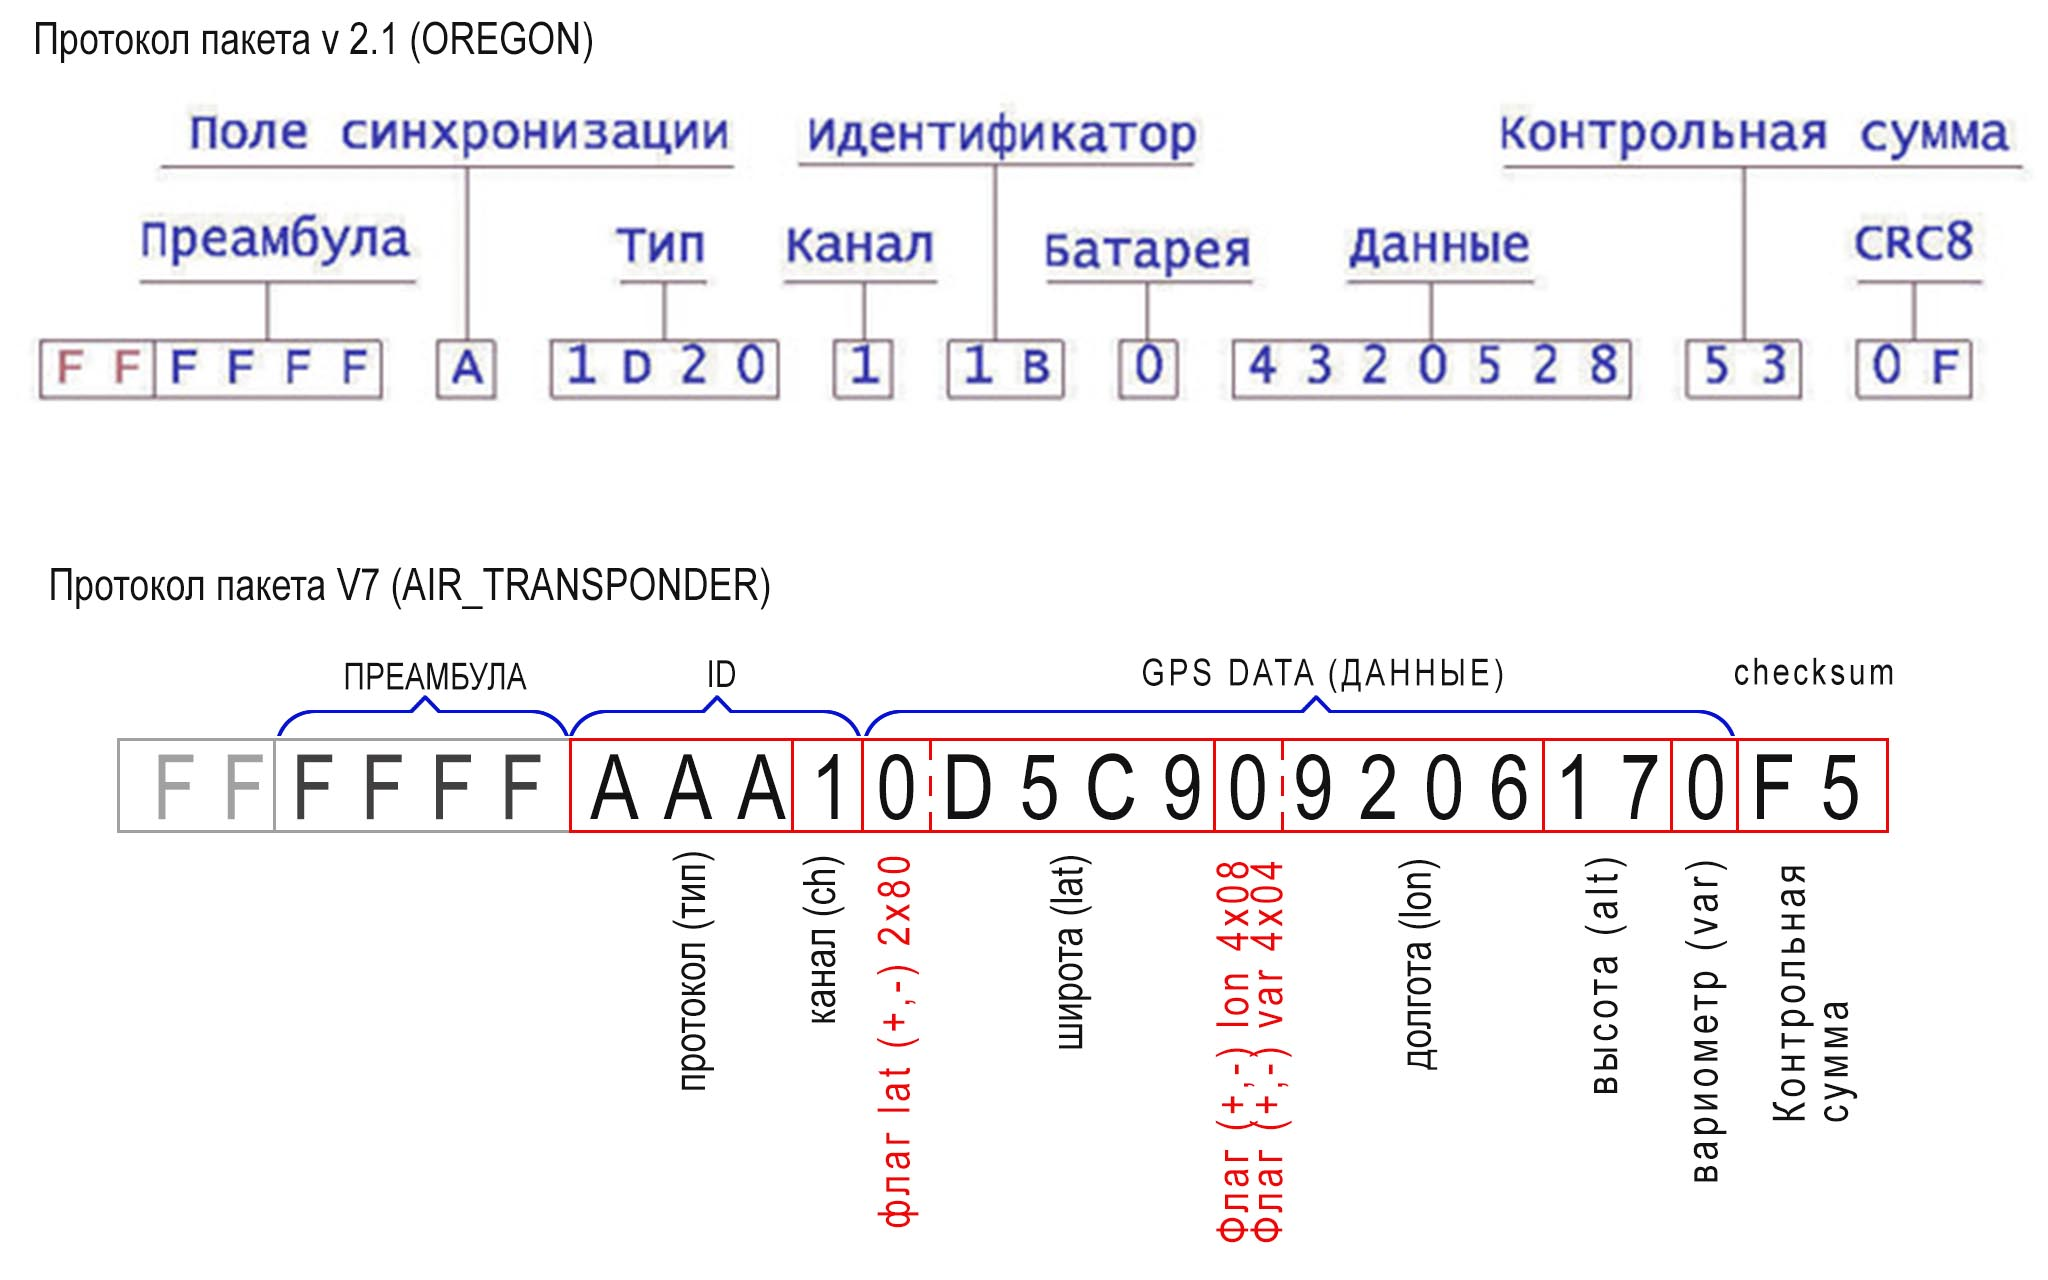 Сравнение типов пакетов V2.1 (OREGON) и пакет V7 (AIR_TRANSPONDER)